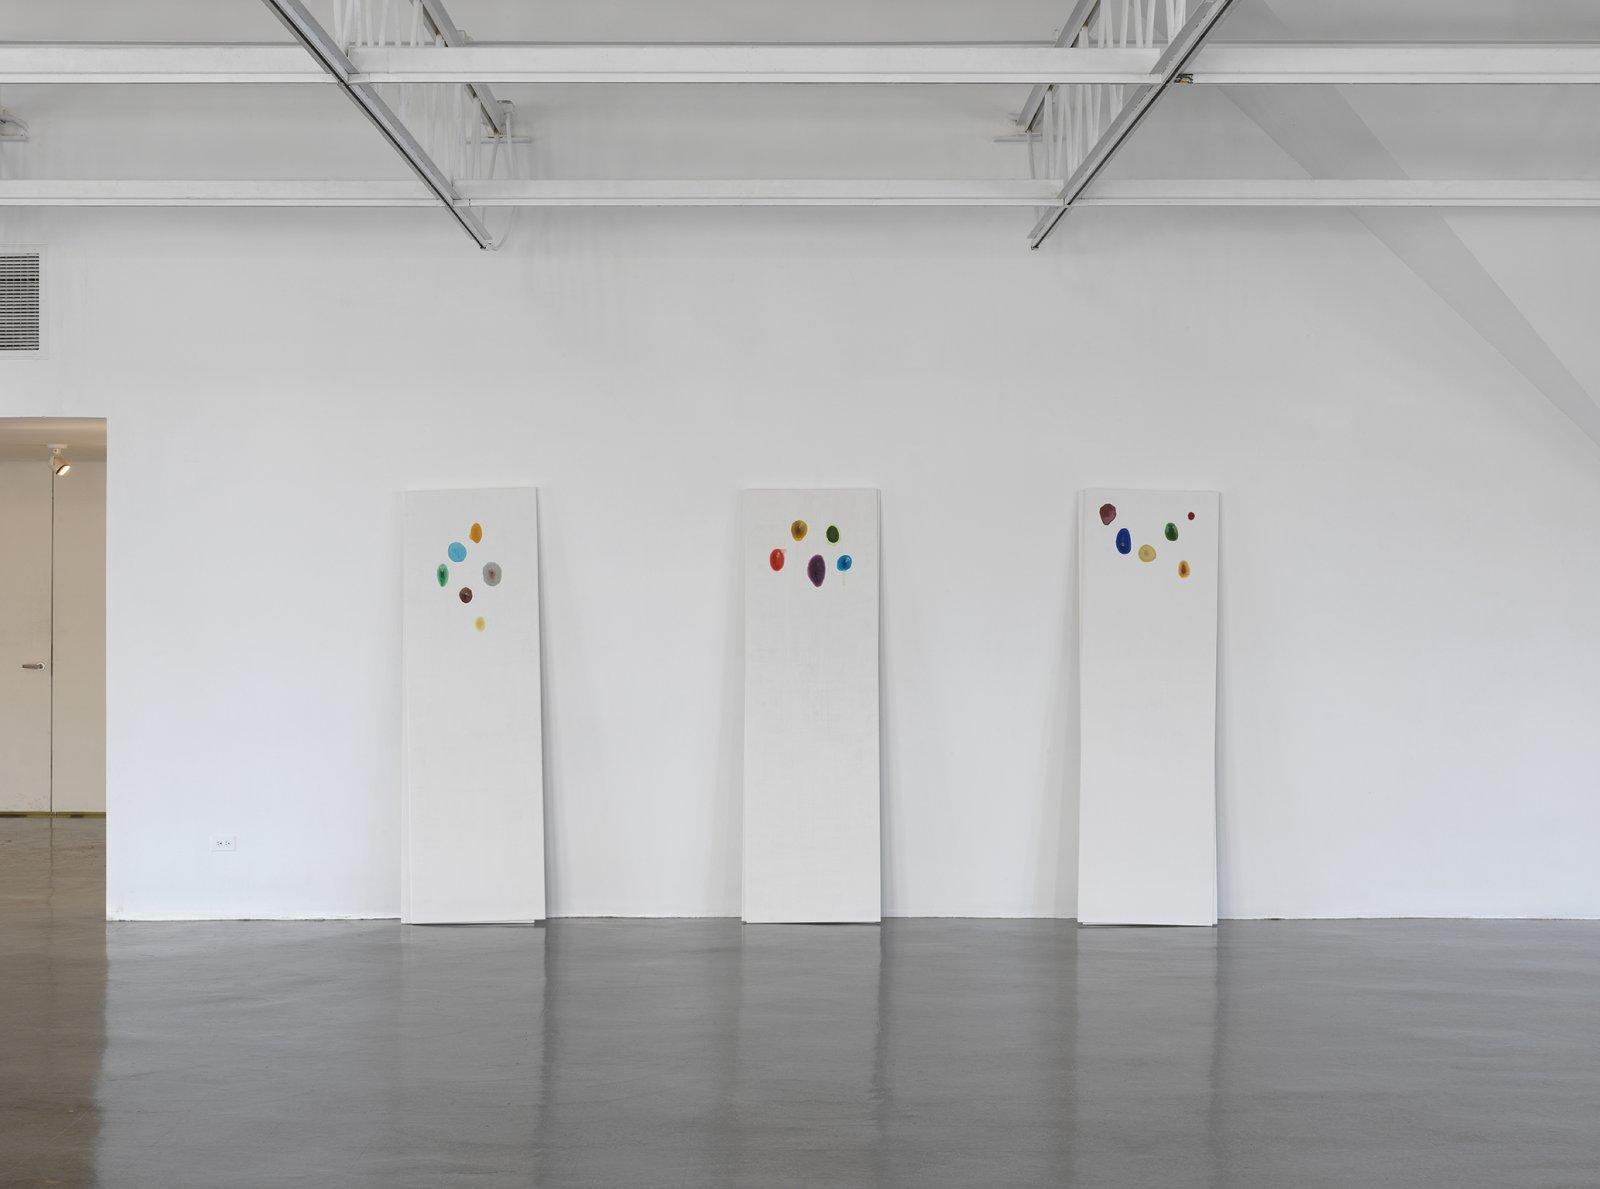 Christina Mackie, installation view, Colour drop, The Renaissance Society, Chicago, IL, 2014 by Christina Mackie